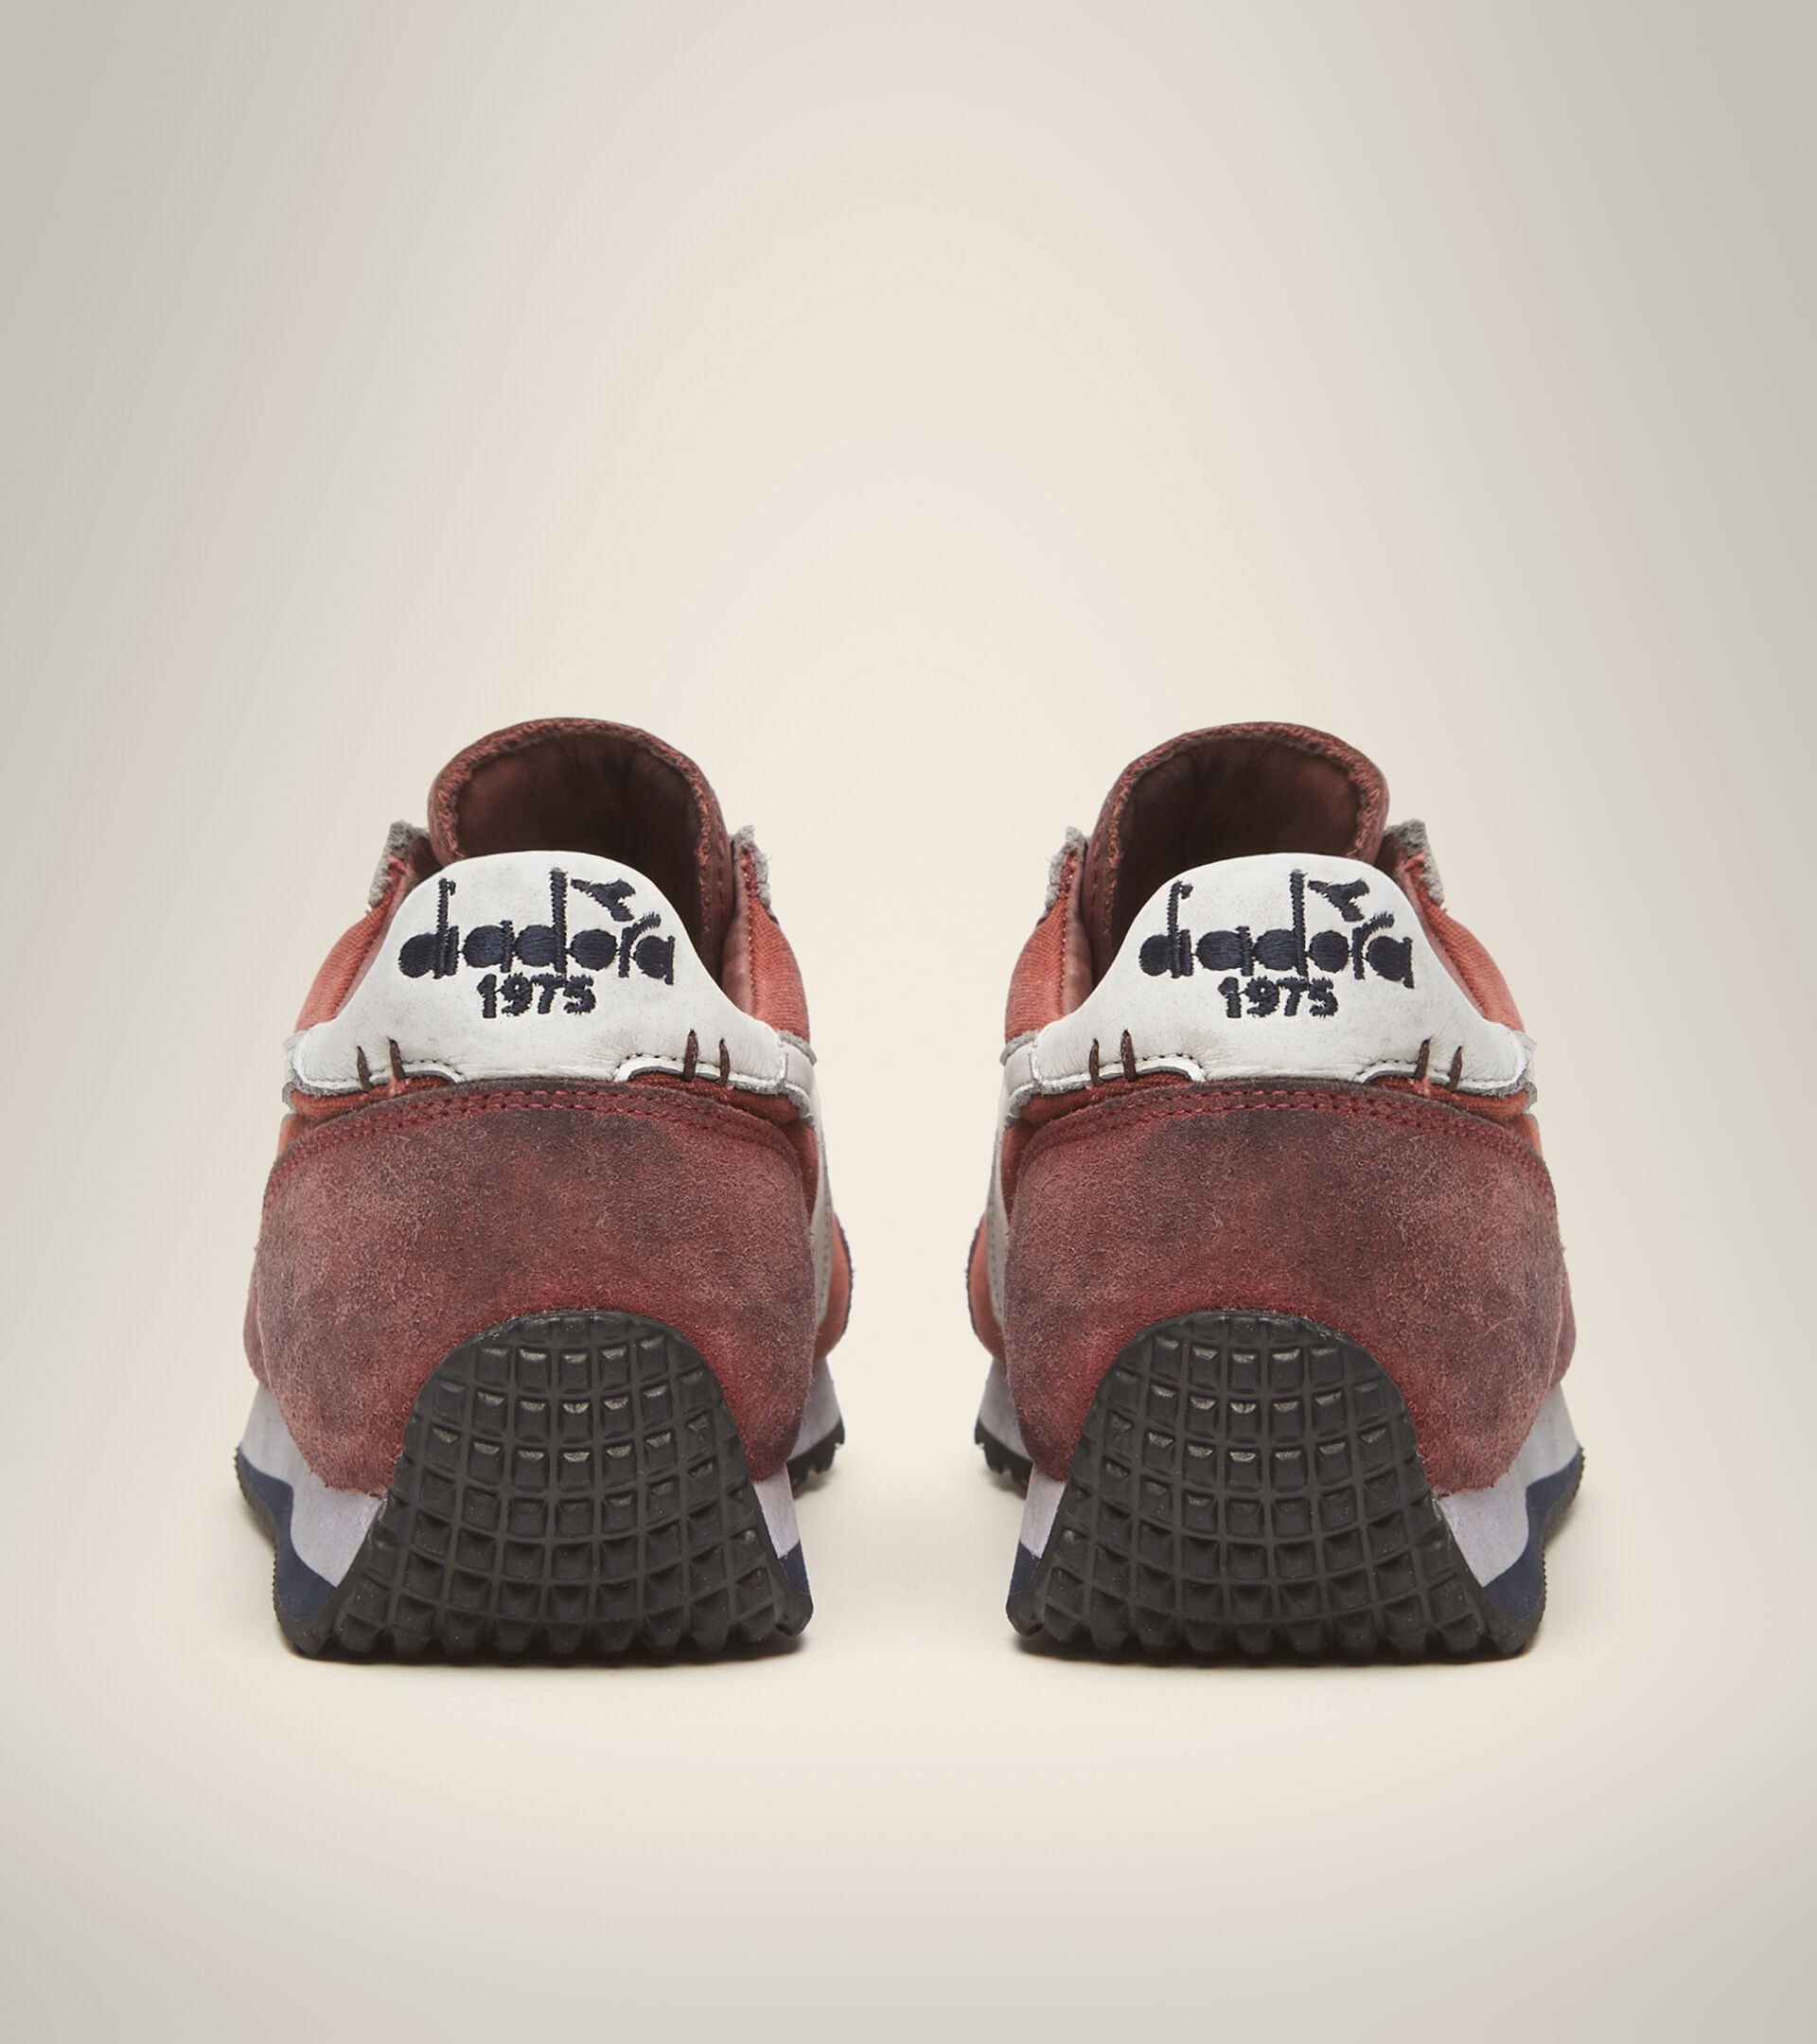 Footwear Heritage UNISEX EQUIPE H DIRTY STONE WASH EVO HENNA QUEMADO Diadora